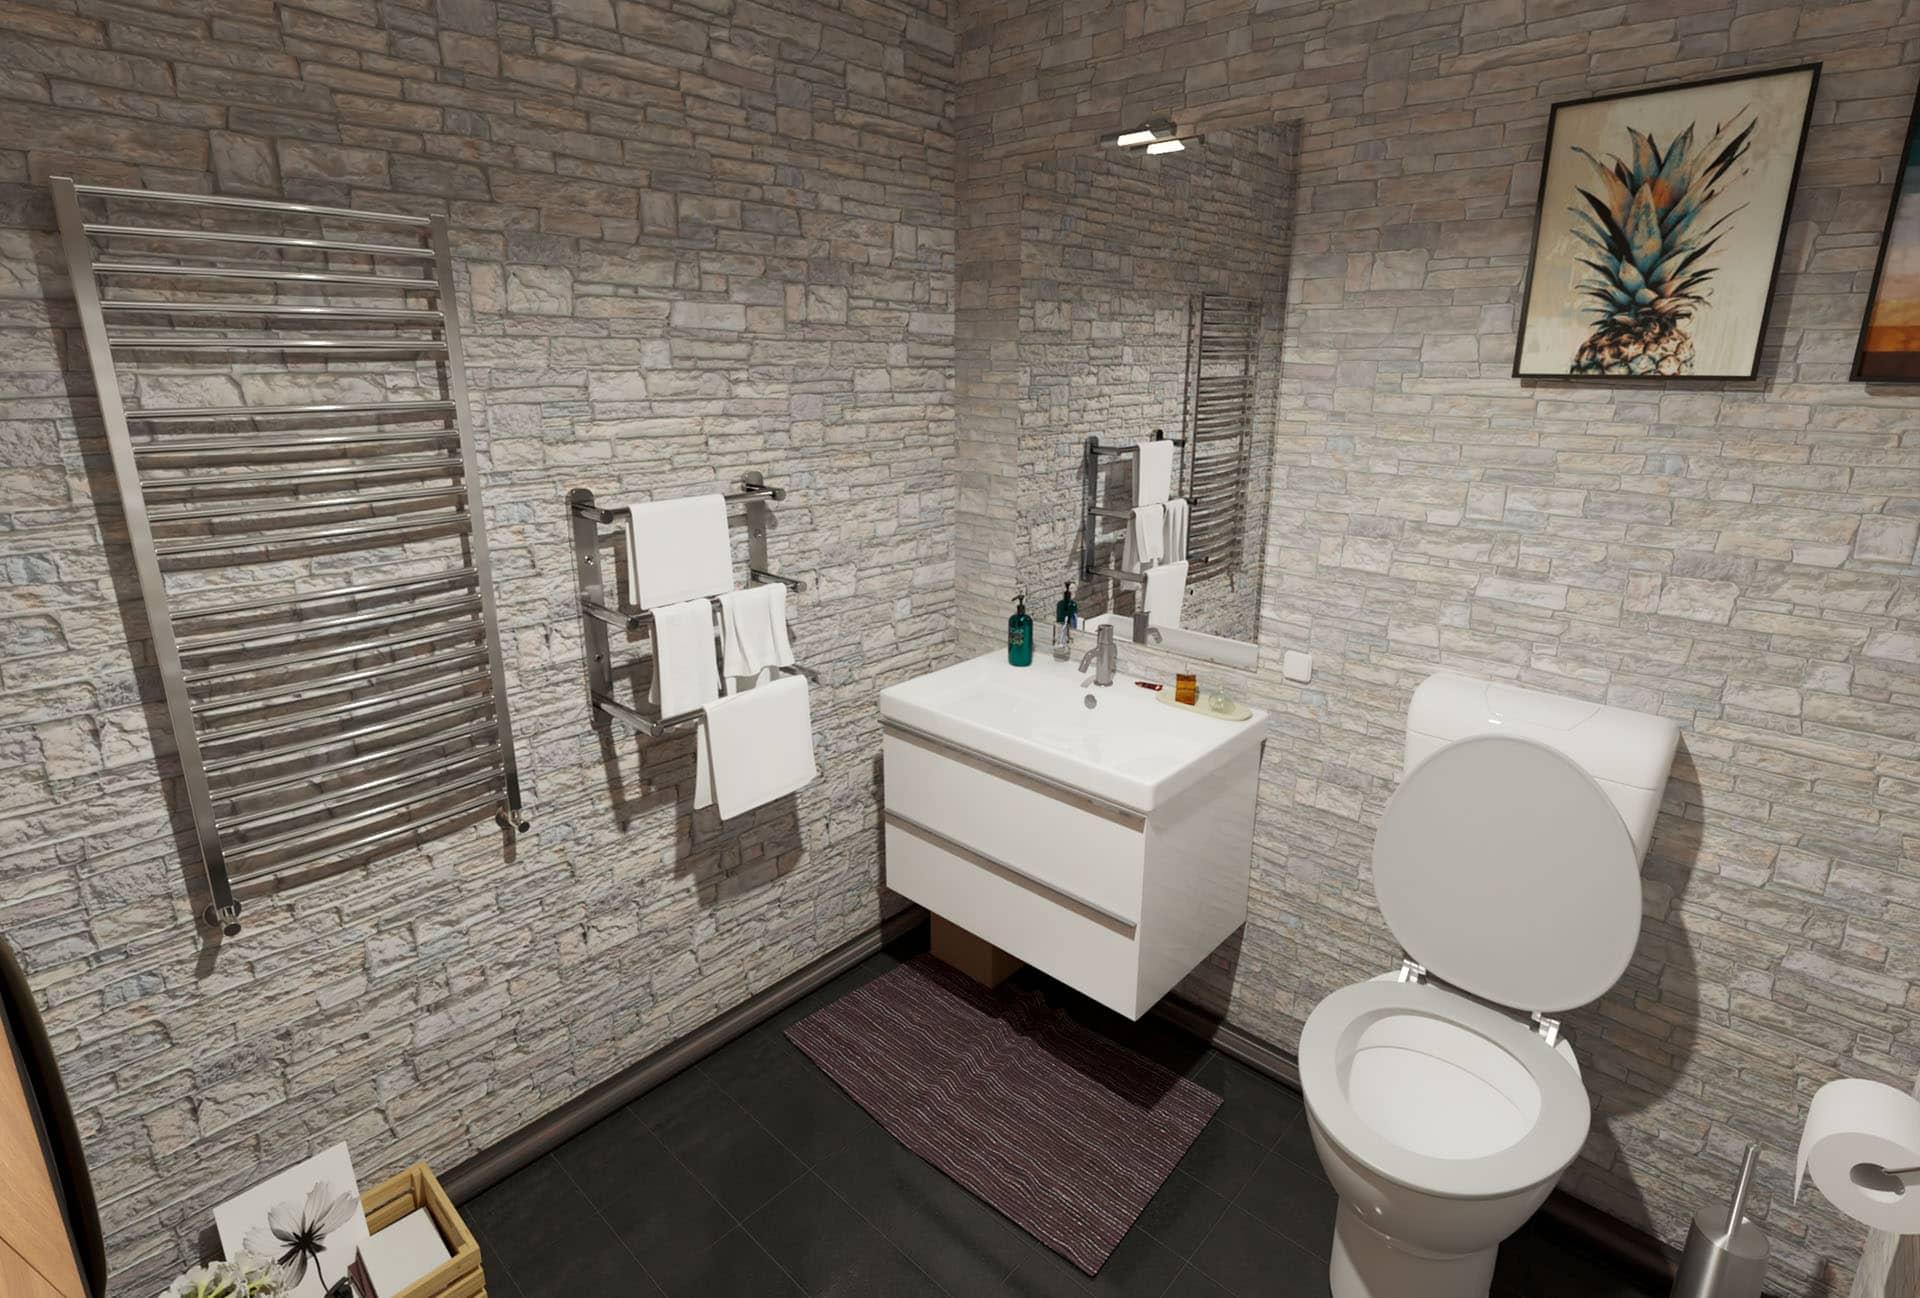 Tualeto 3d vizualizacija